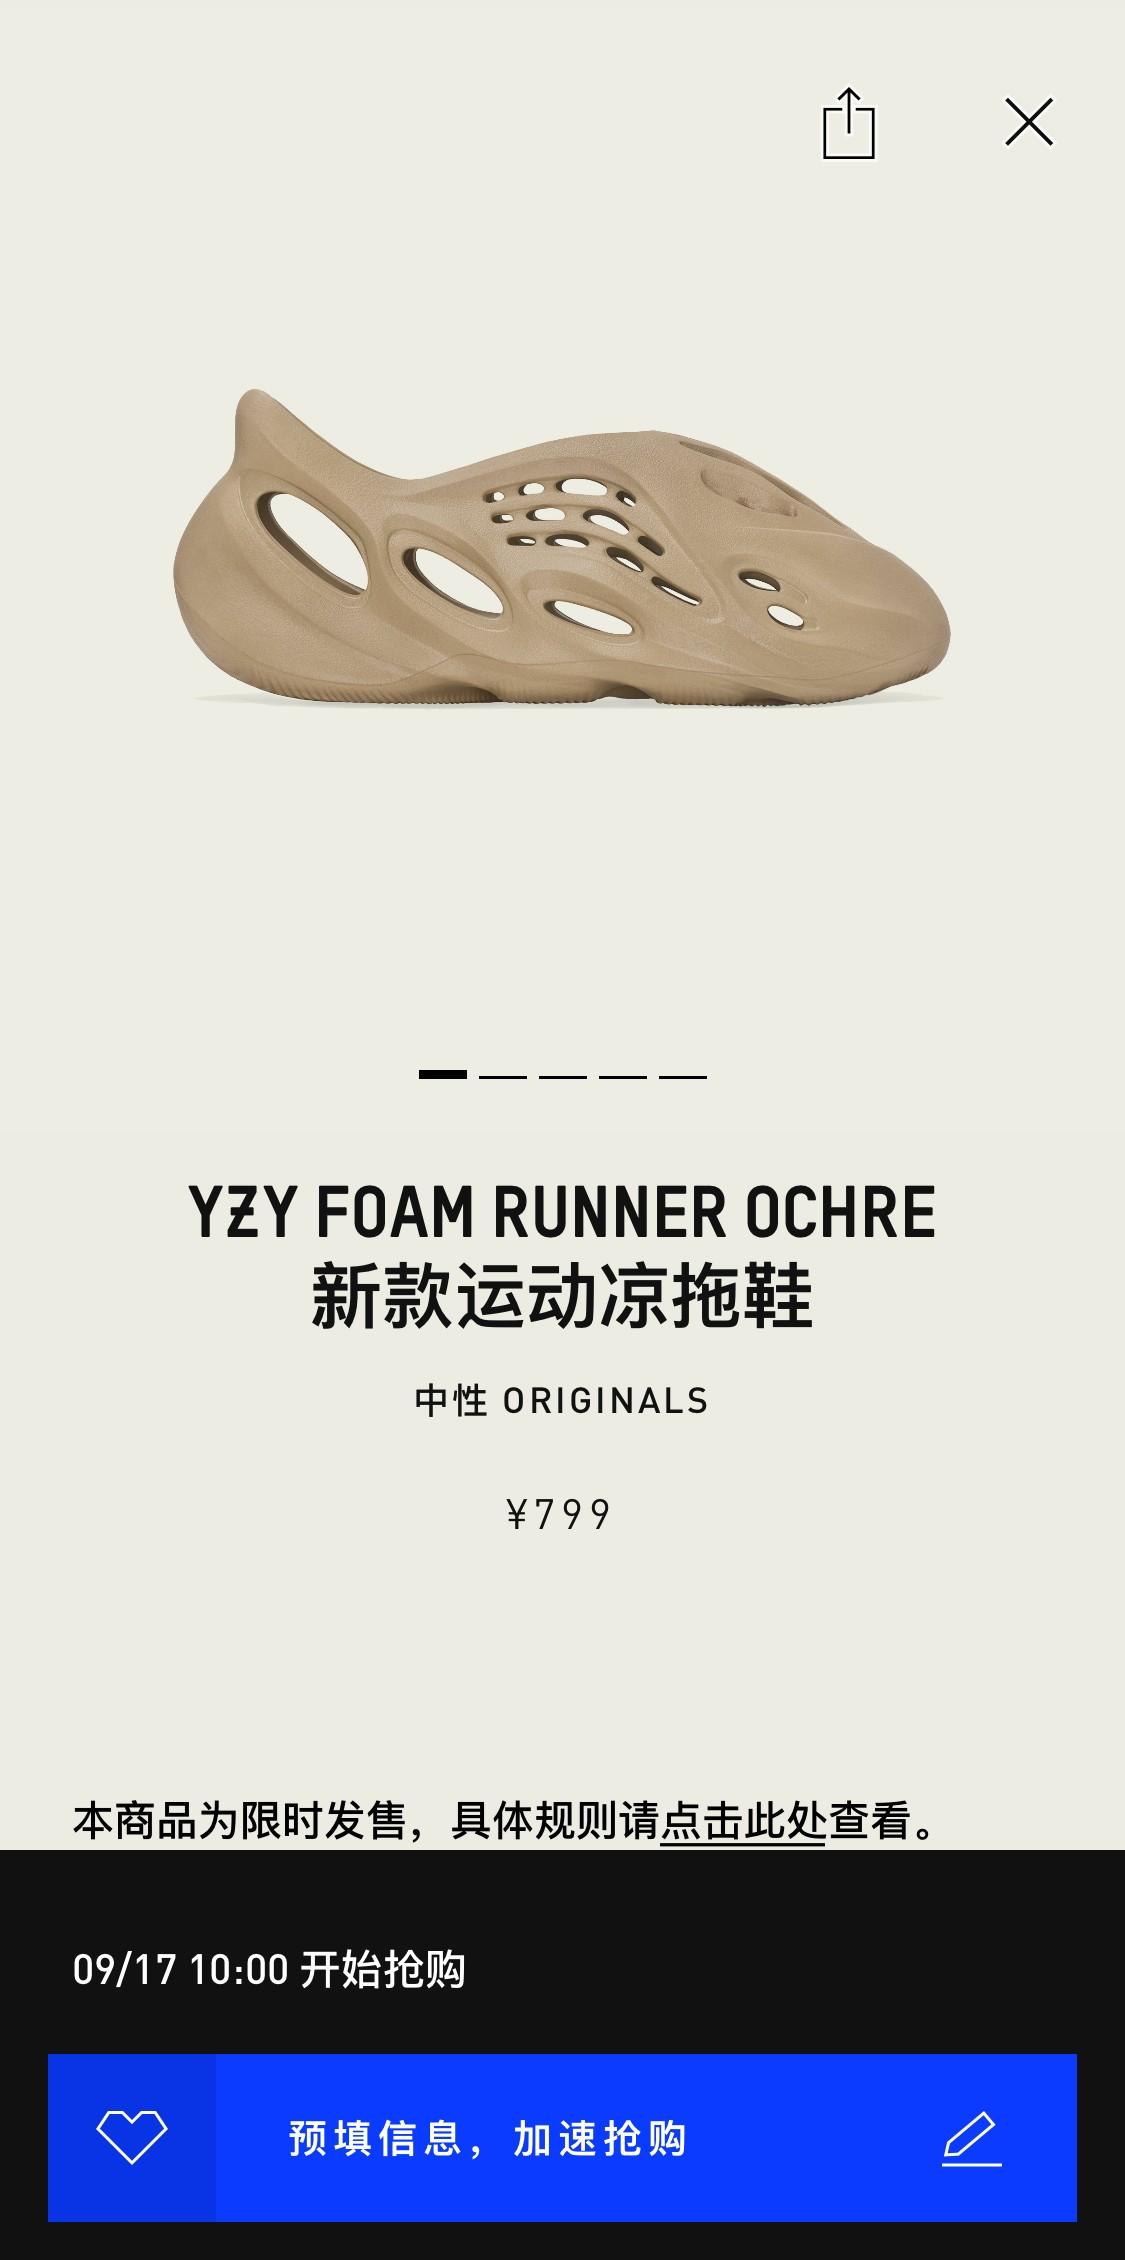 adidas,Yeezy,Foam Runner,Ochre  每双都不便宜!全新 Yeezy「洞洞鞋」刚刚登场!还有最后机会!